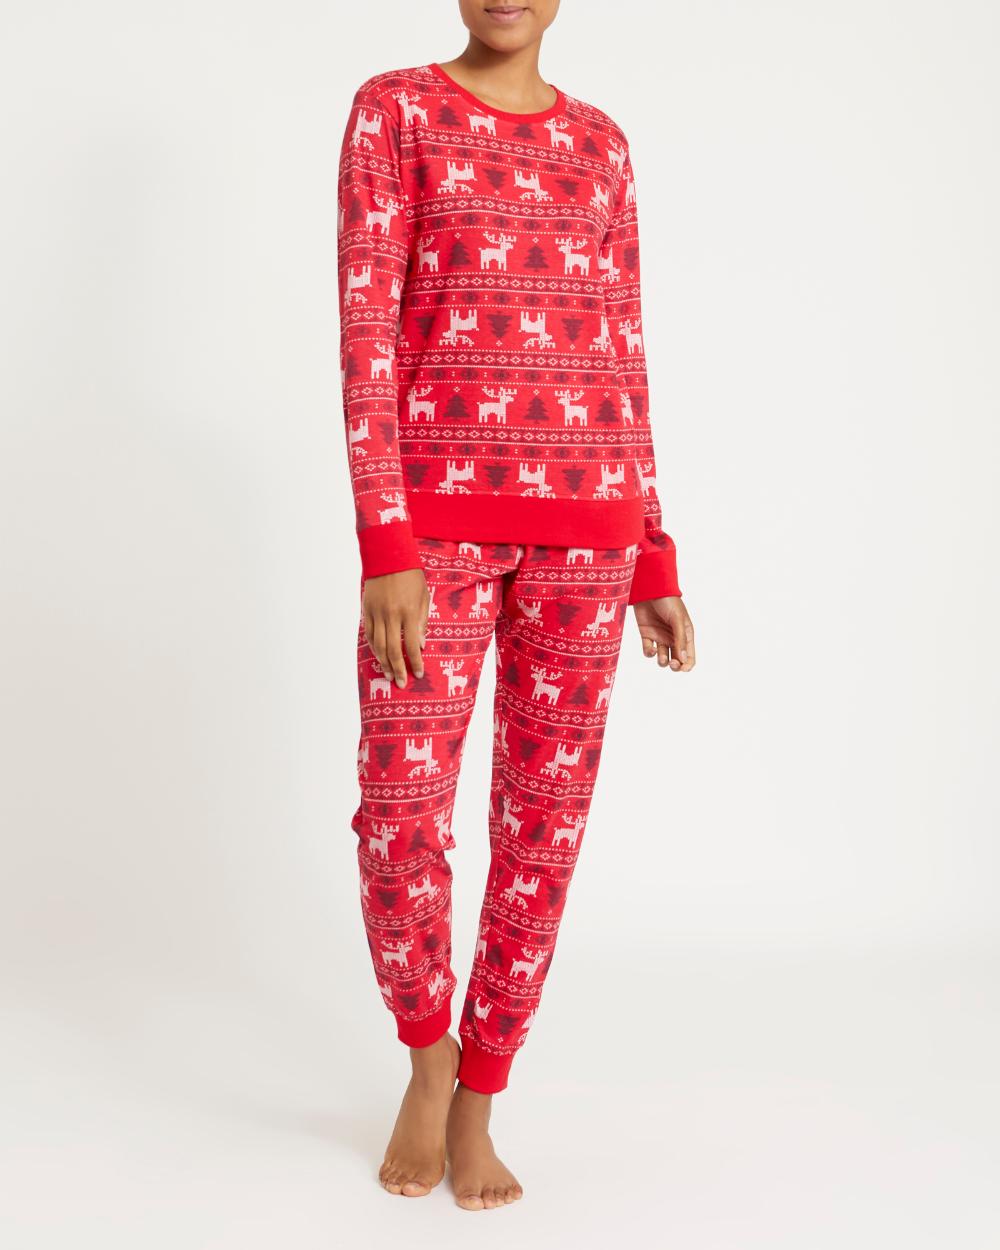 Dunnes Stores Print Christmas Family Fairisle Pyjamas